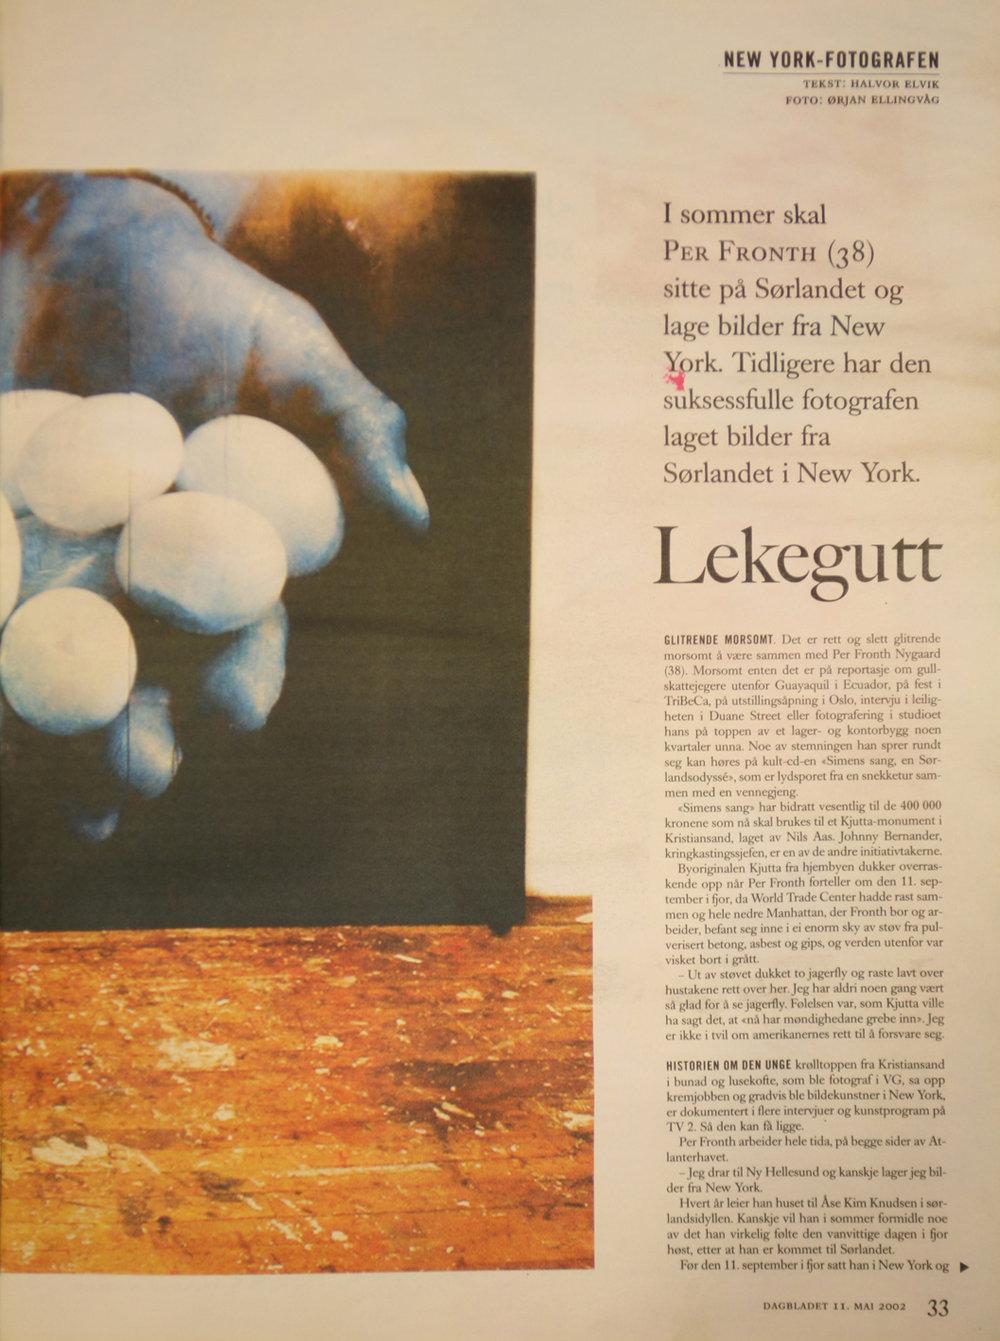 db.magasinet.2002.33.jpg